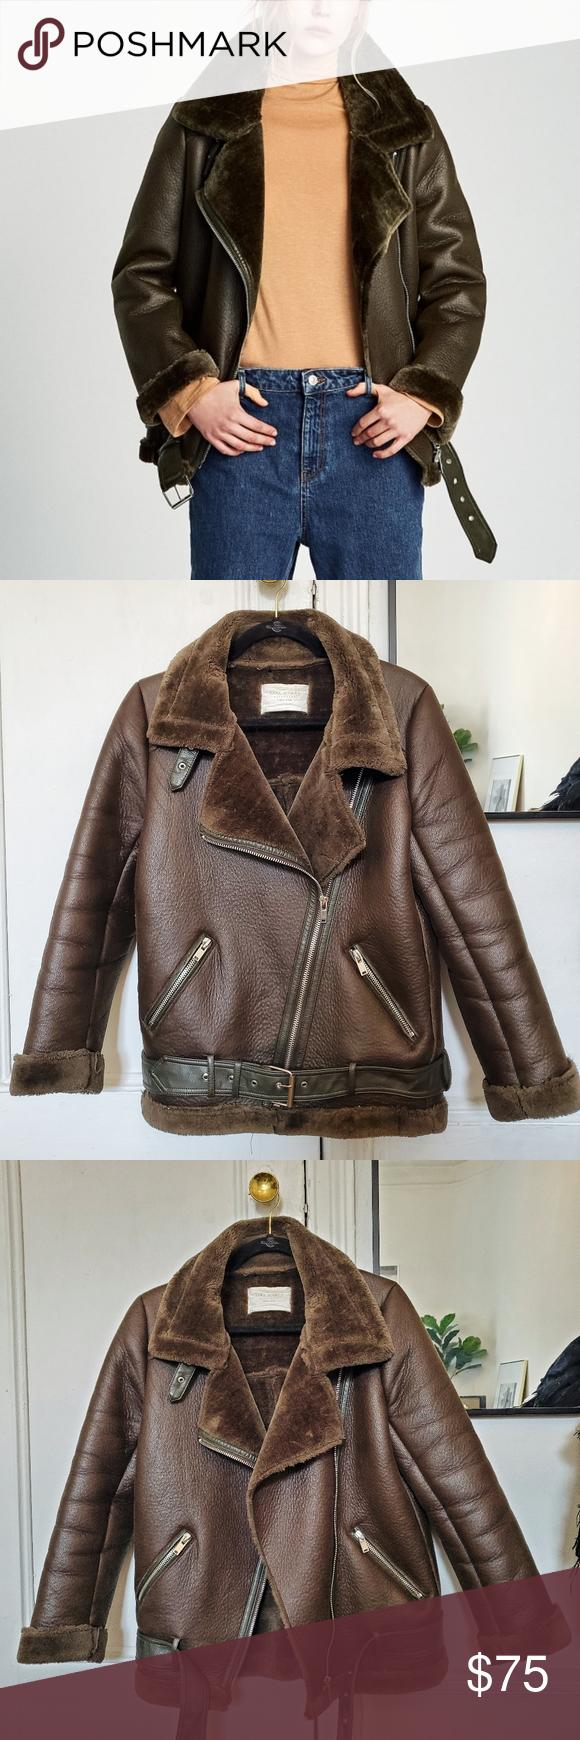 ZARA Faux Leather and Fur Aviator Biker Jacket Biker